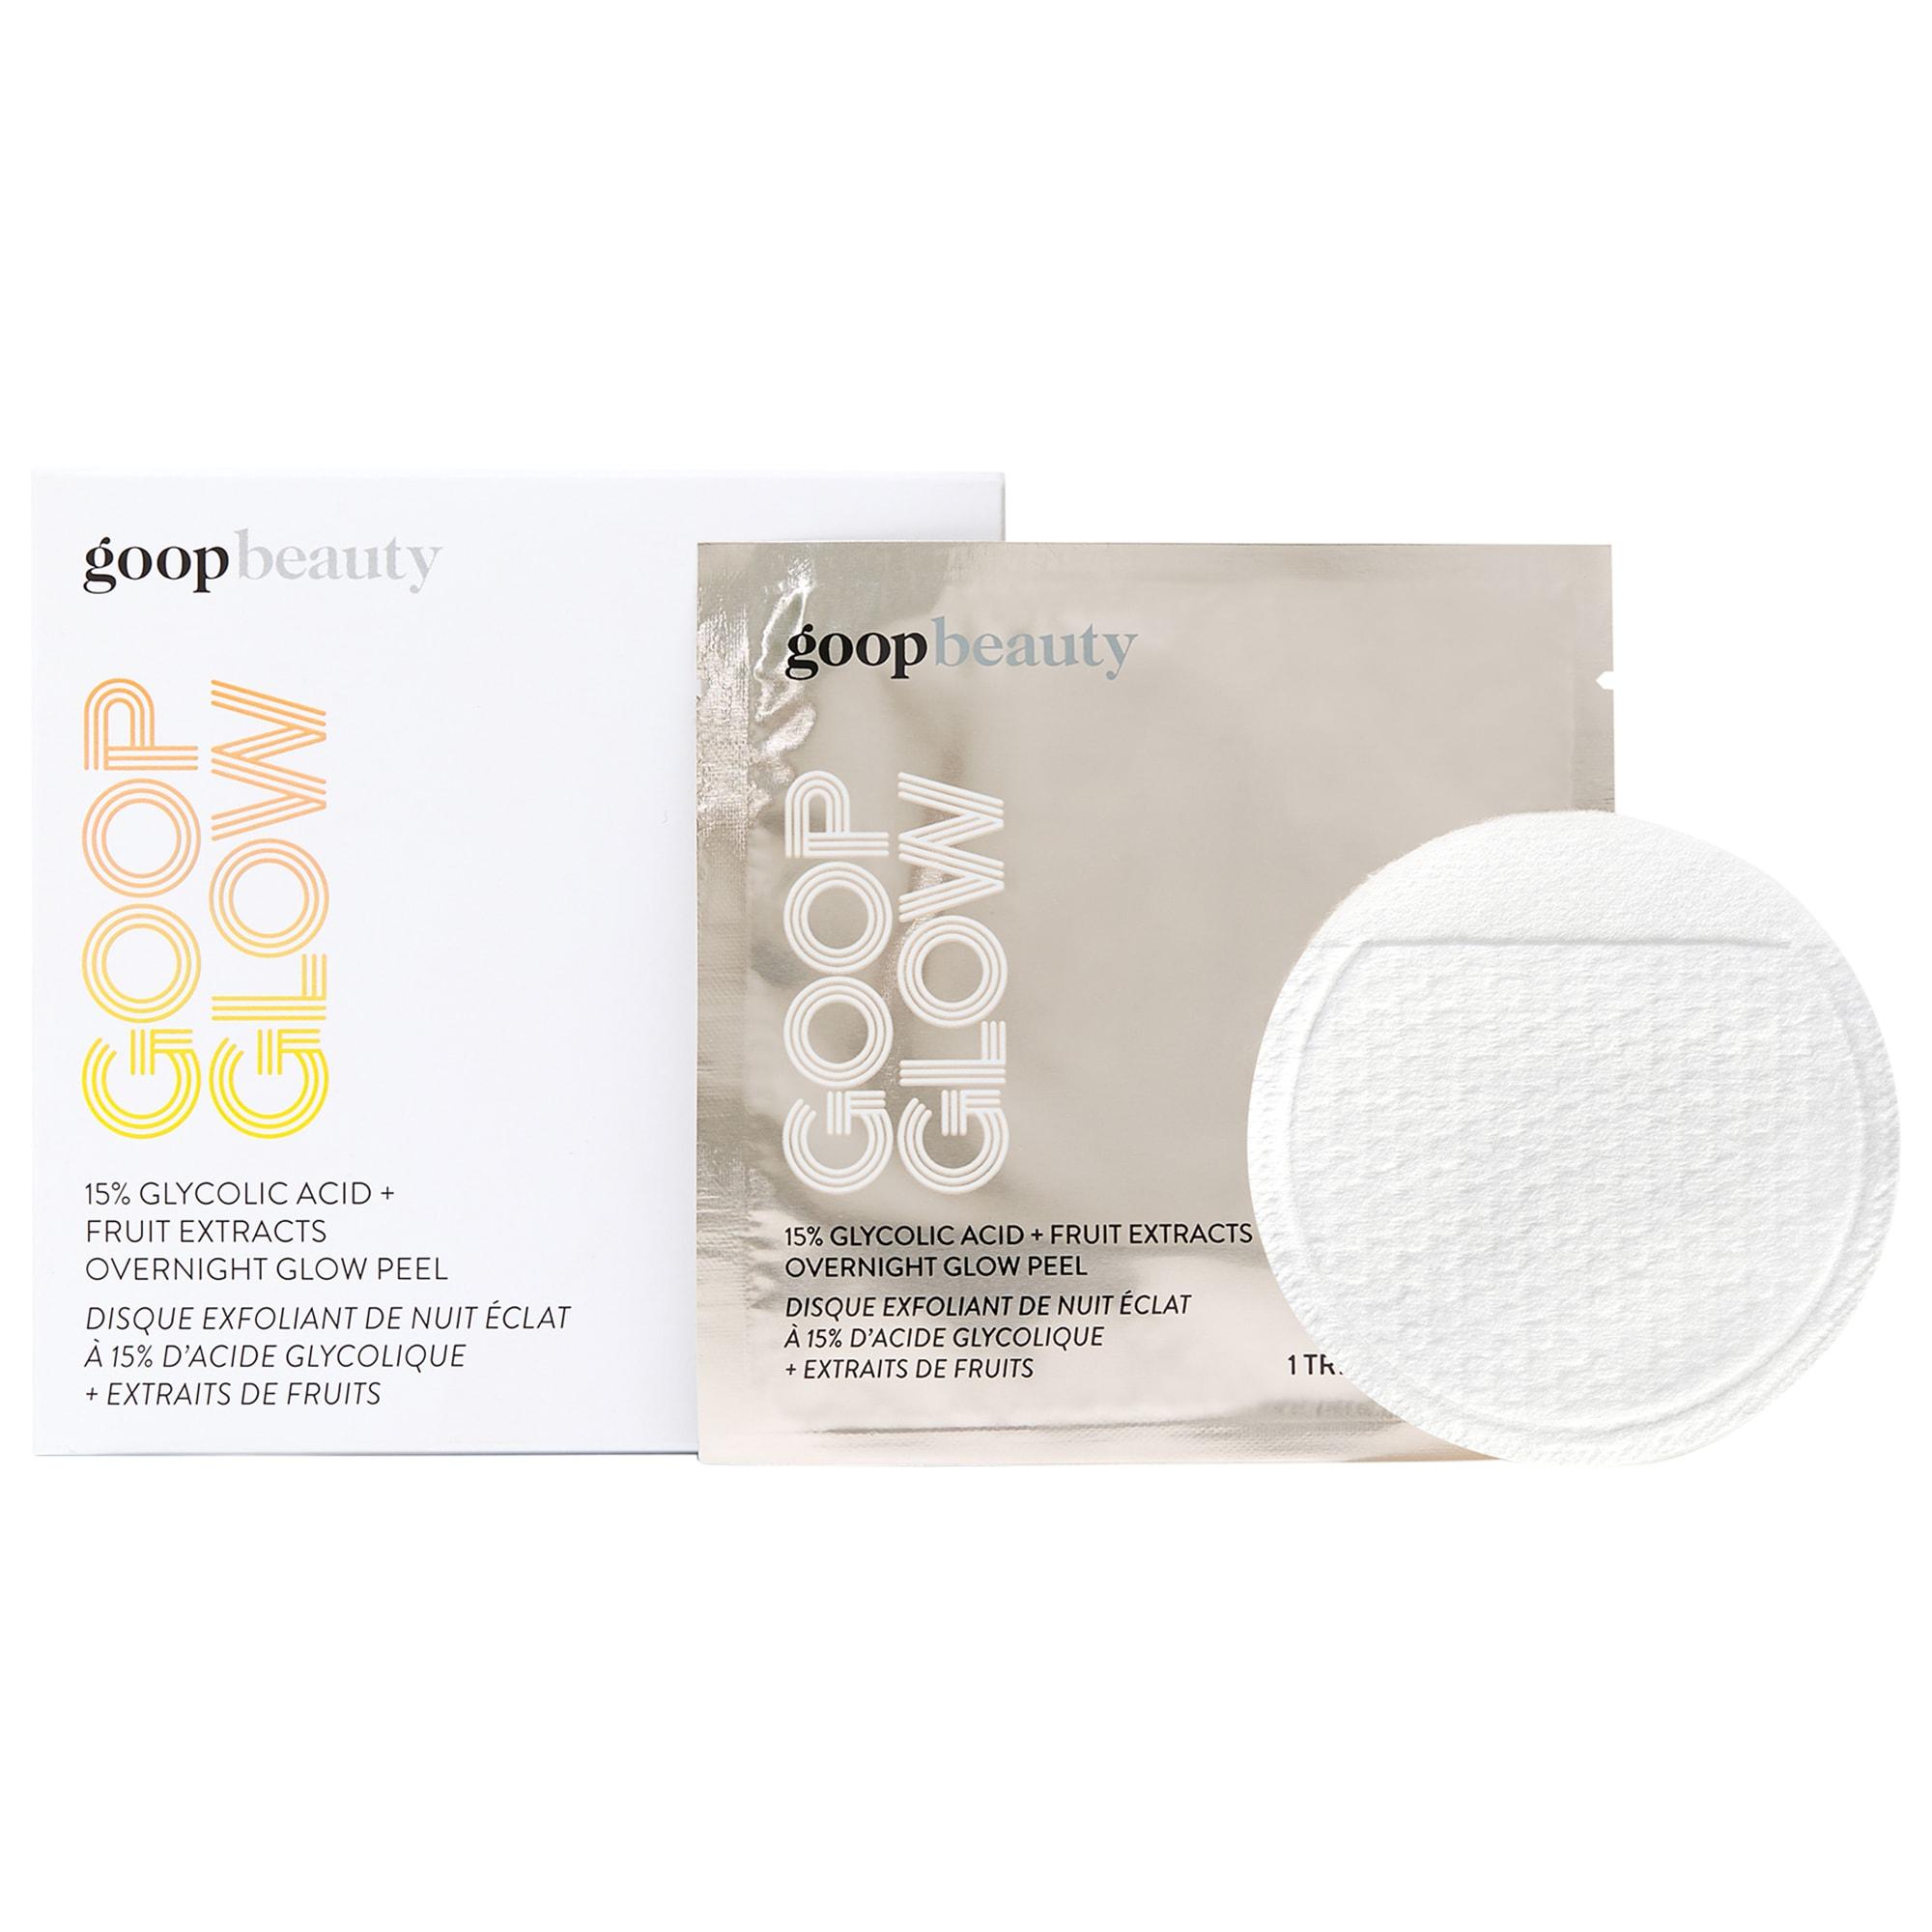 Goop - Mini GOOPGLOW 15% Glycolic Acid Overnight Glow Peel